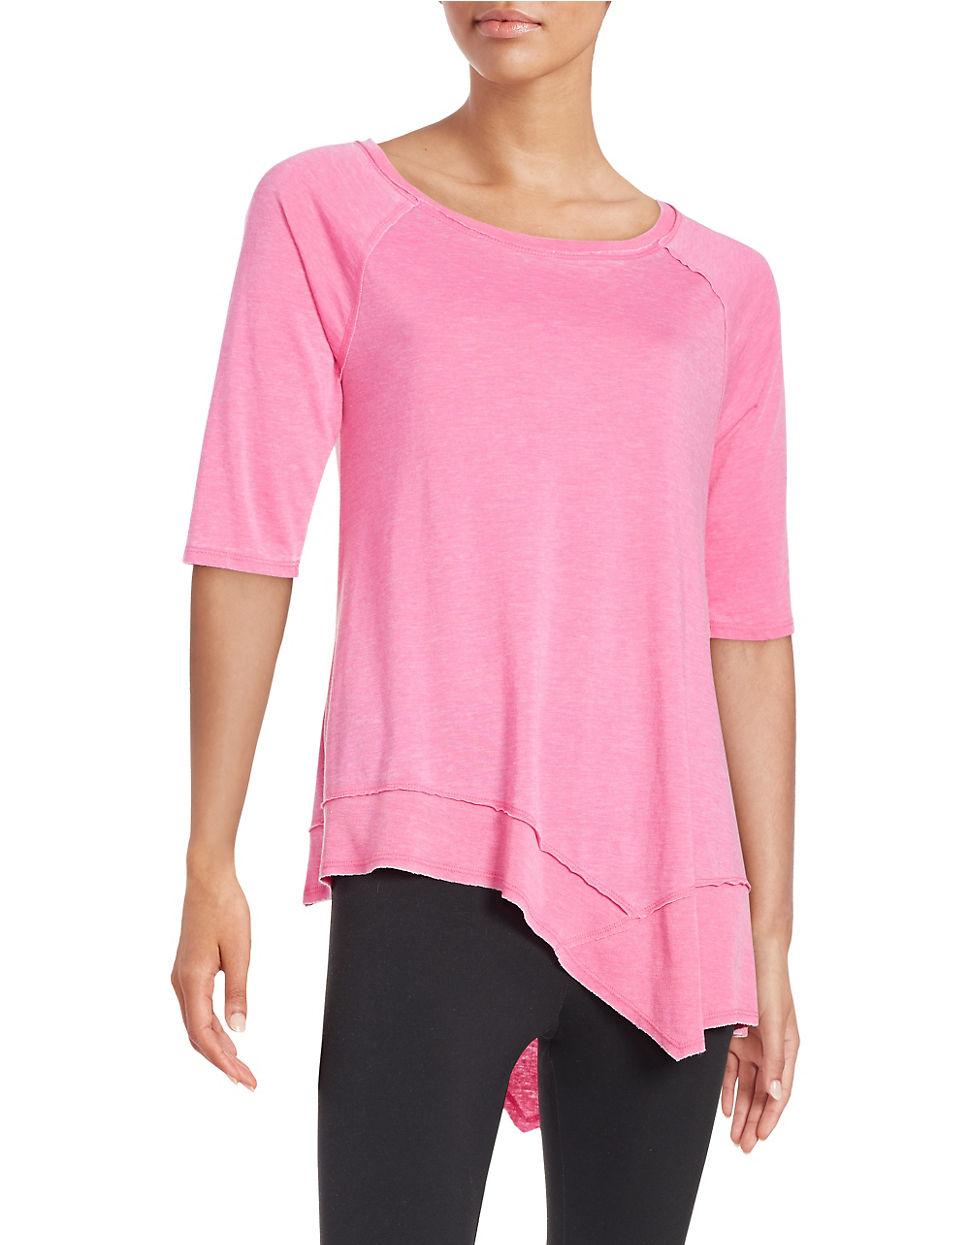 Rafaella Clothing Macy S